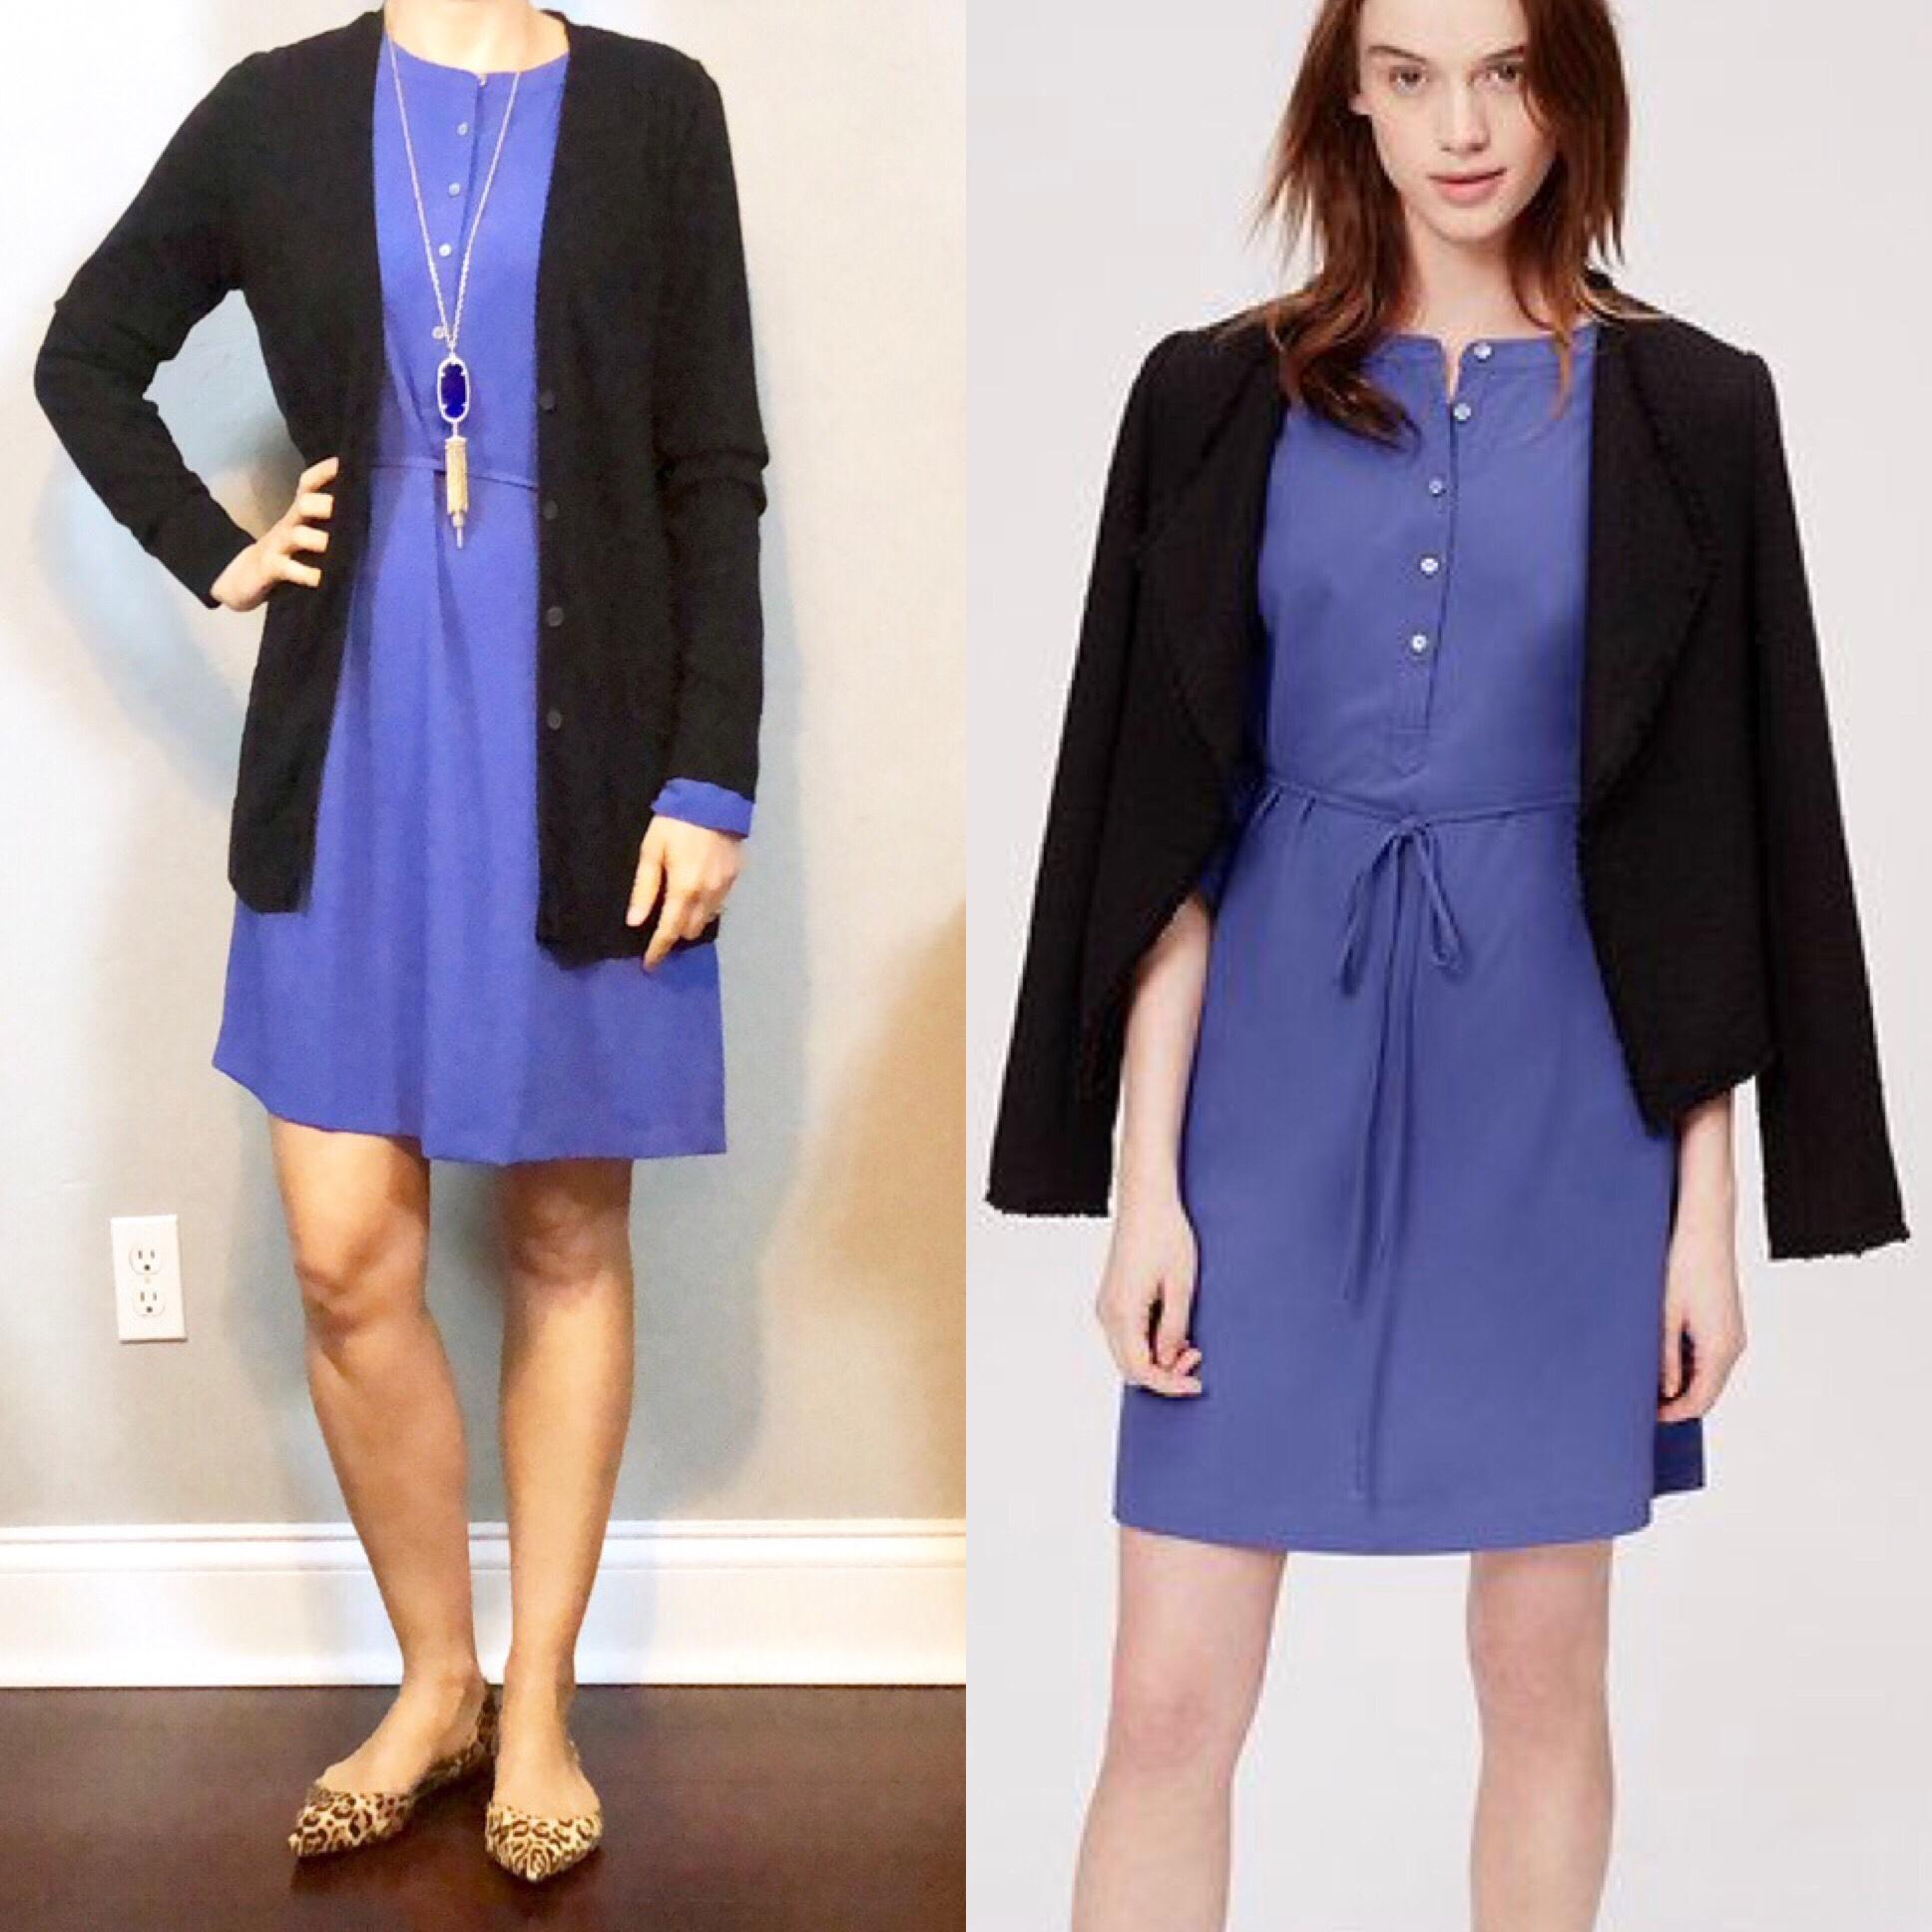 8120727878e outfit posts  blue henley dress